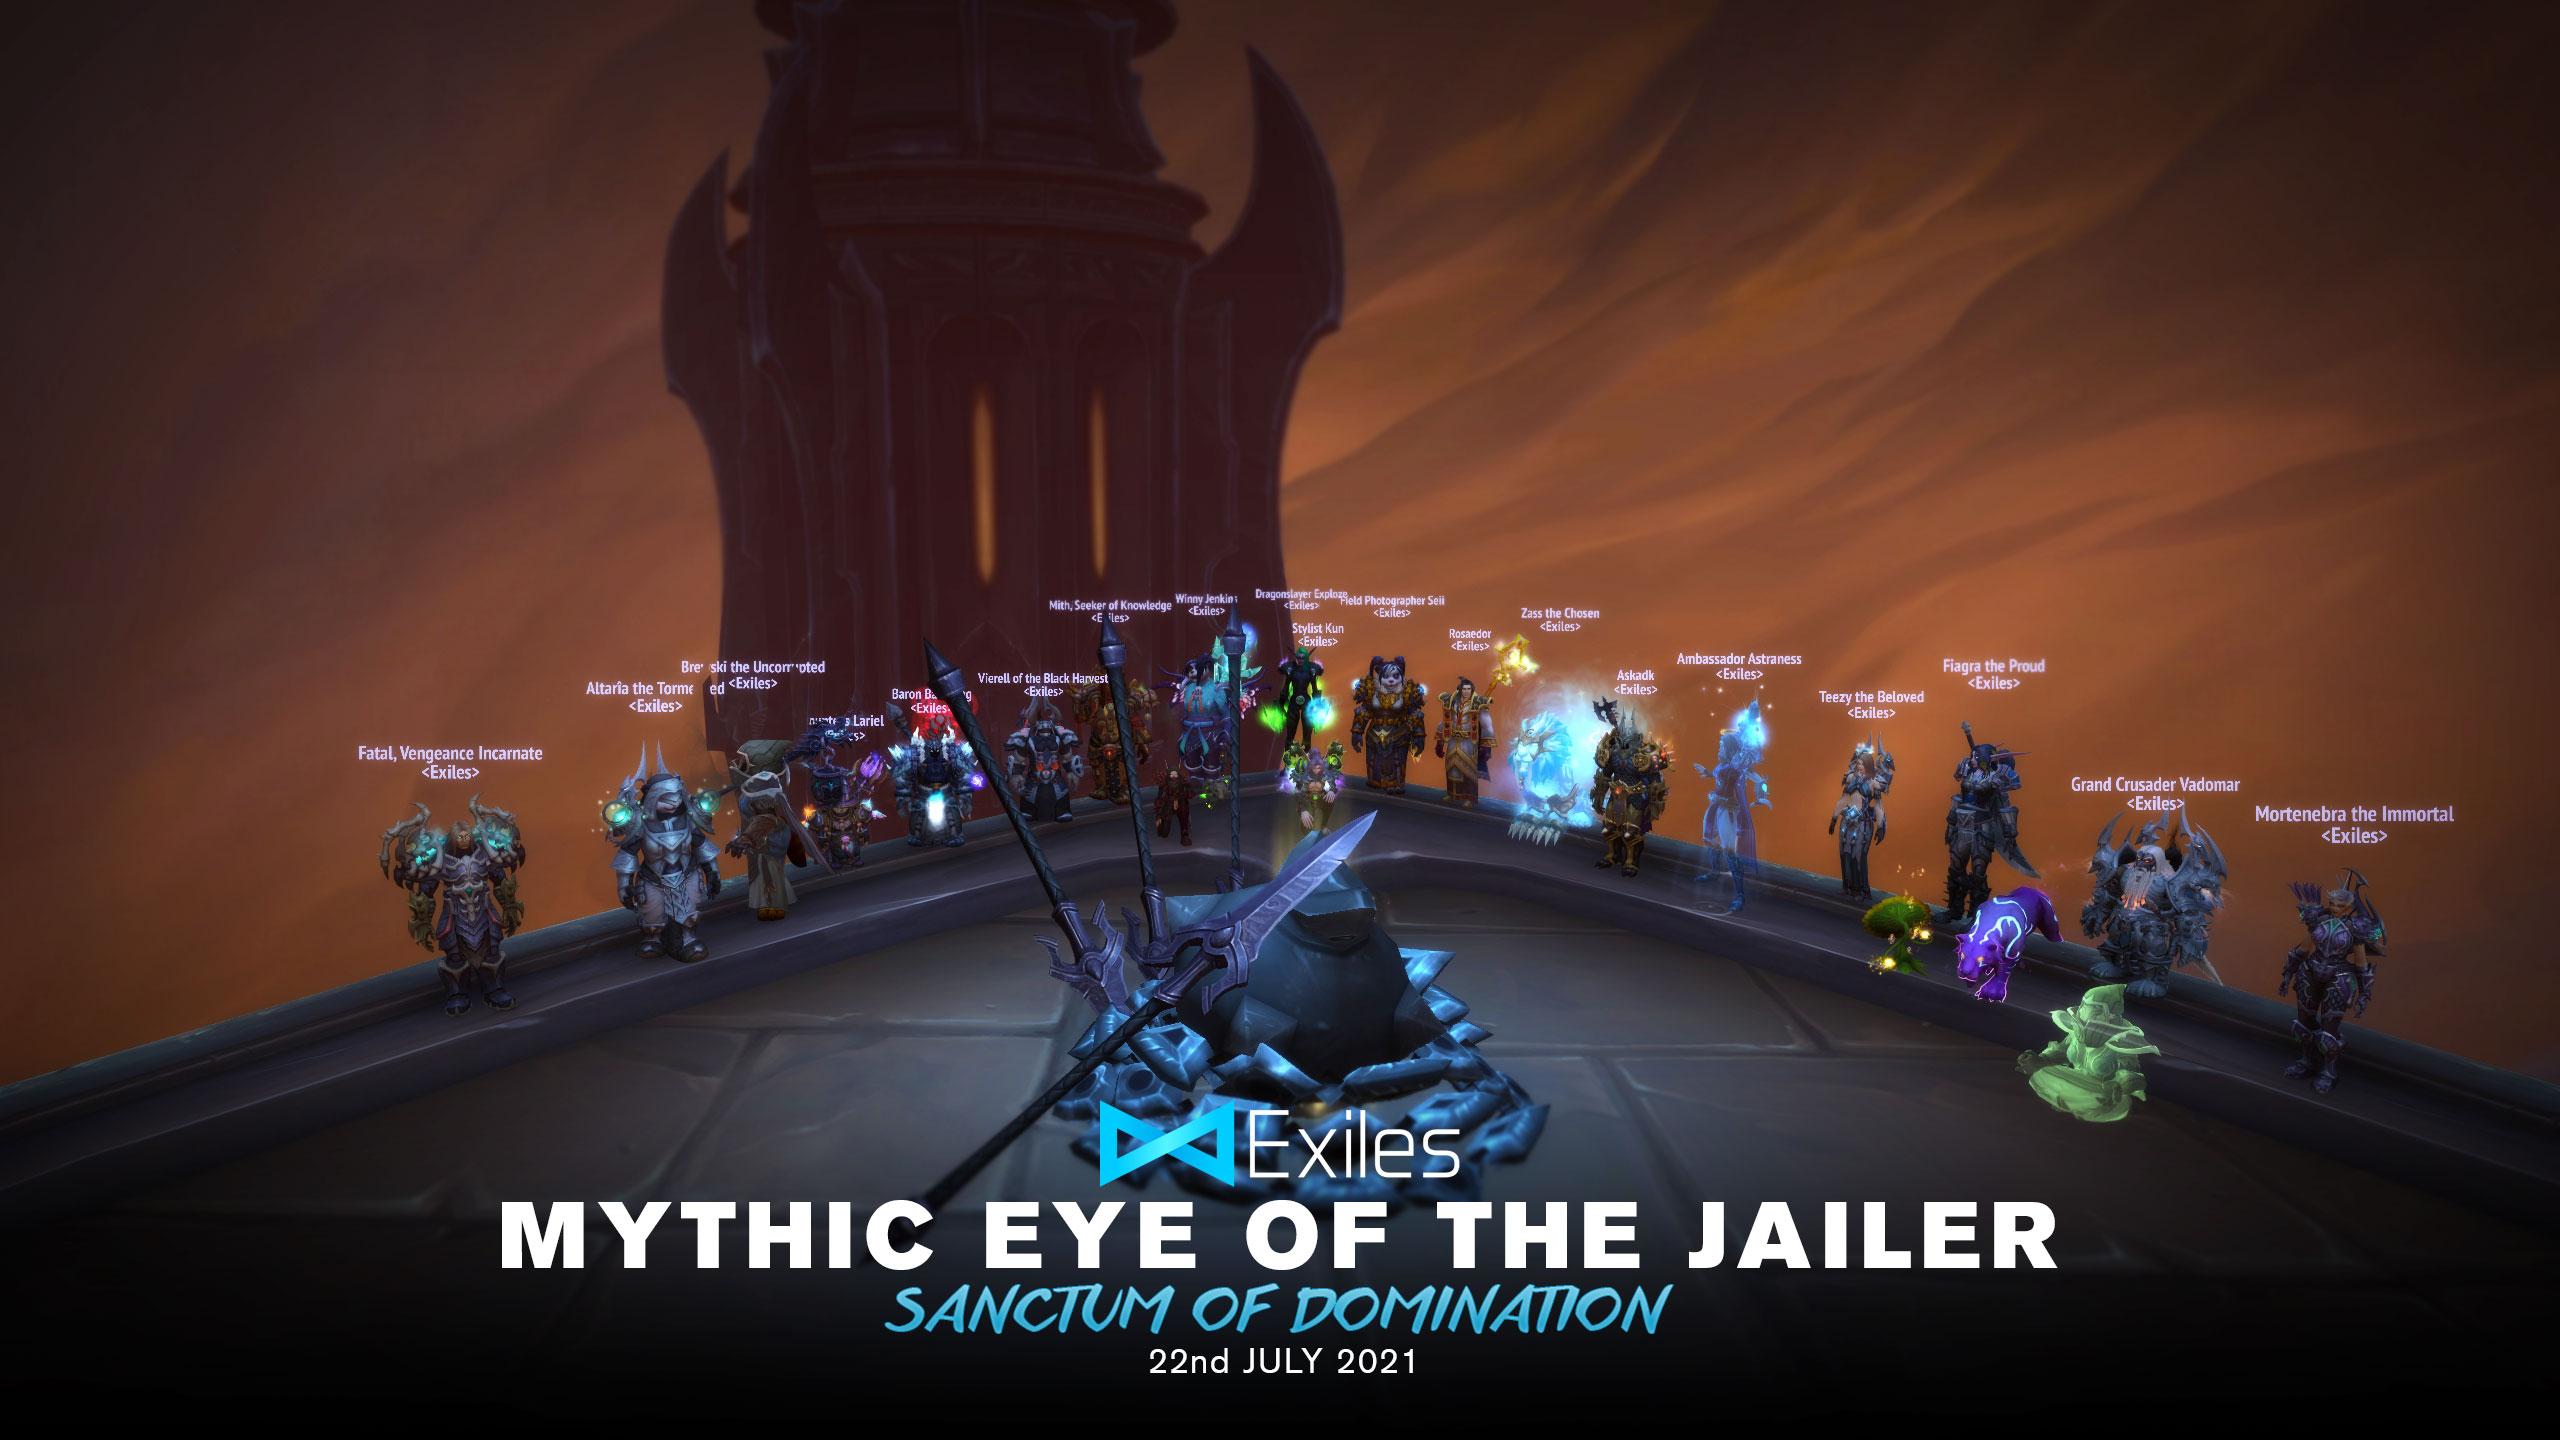 mythic eye of the jailer